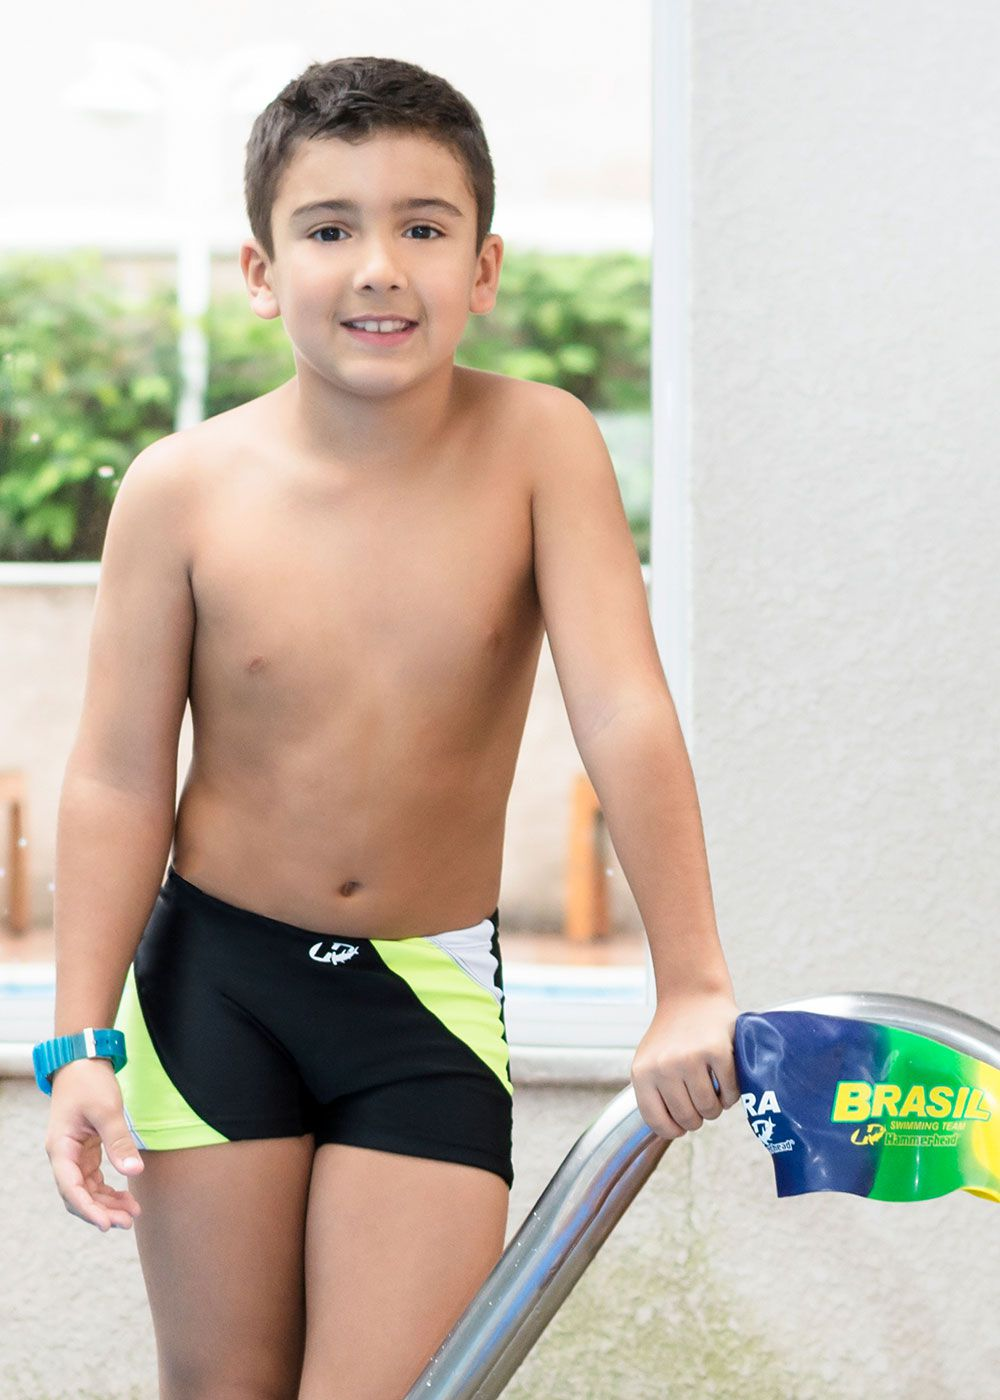 SUNGA BOXER JR. XL DADY